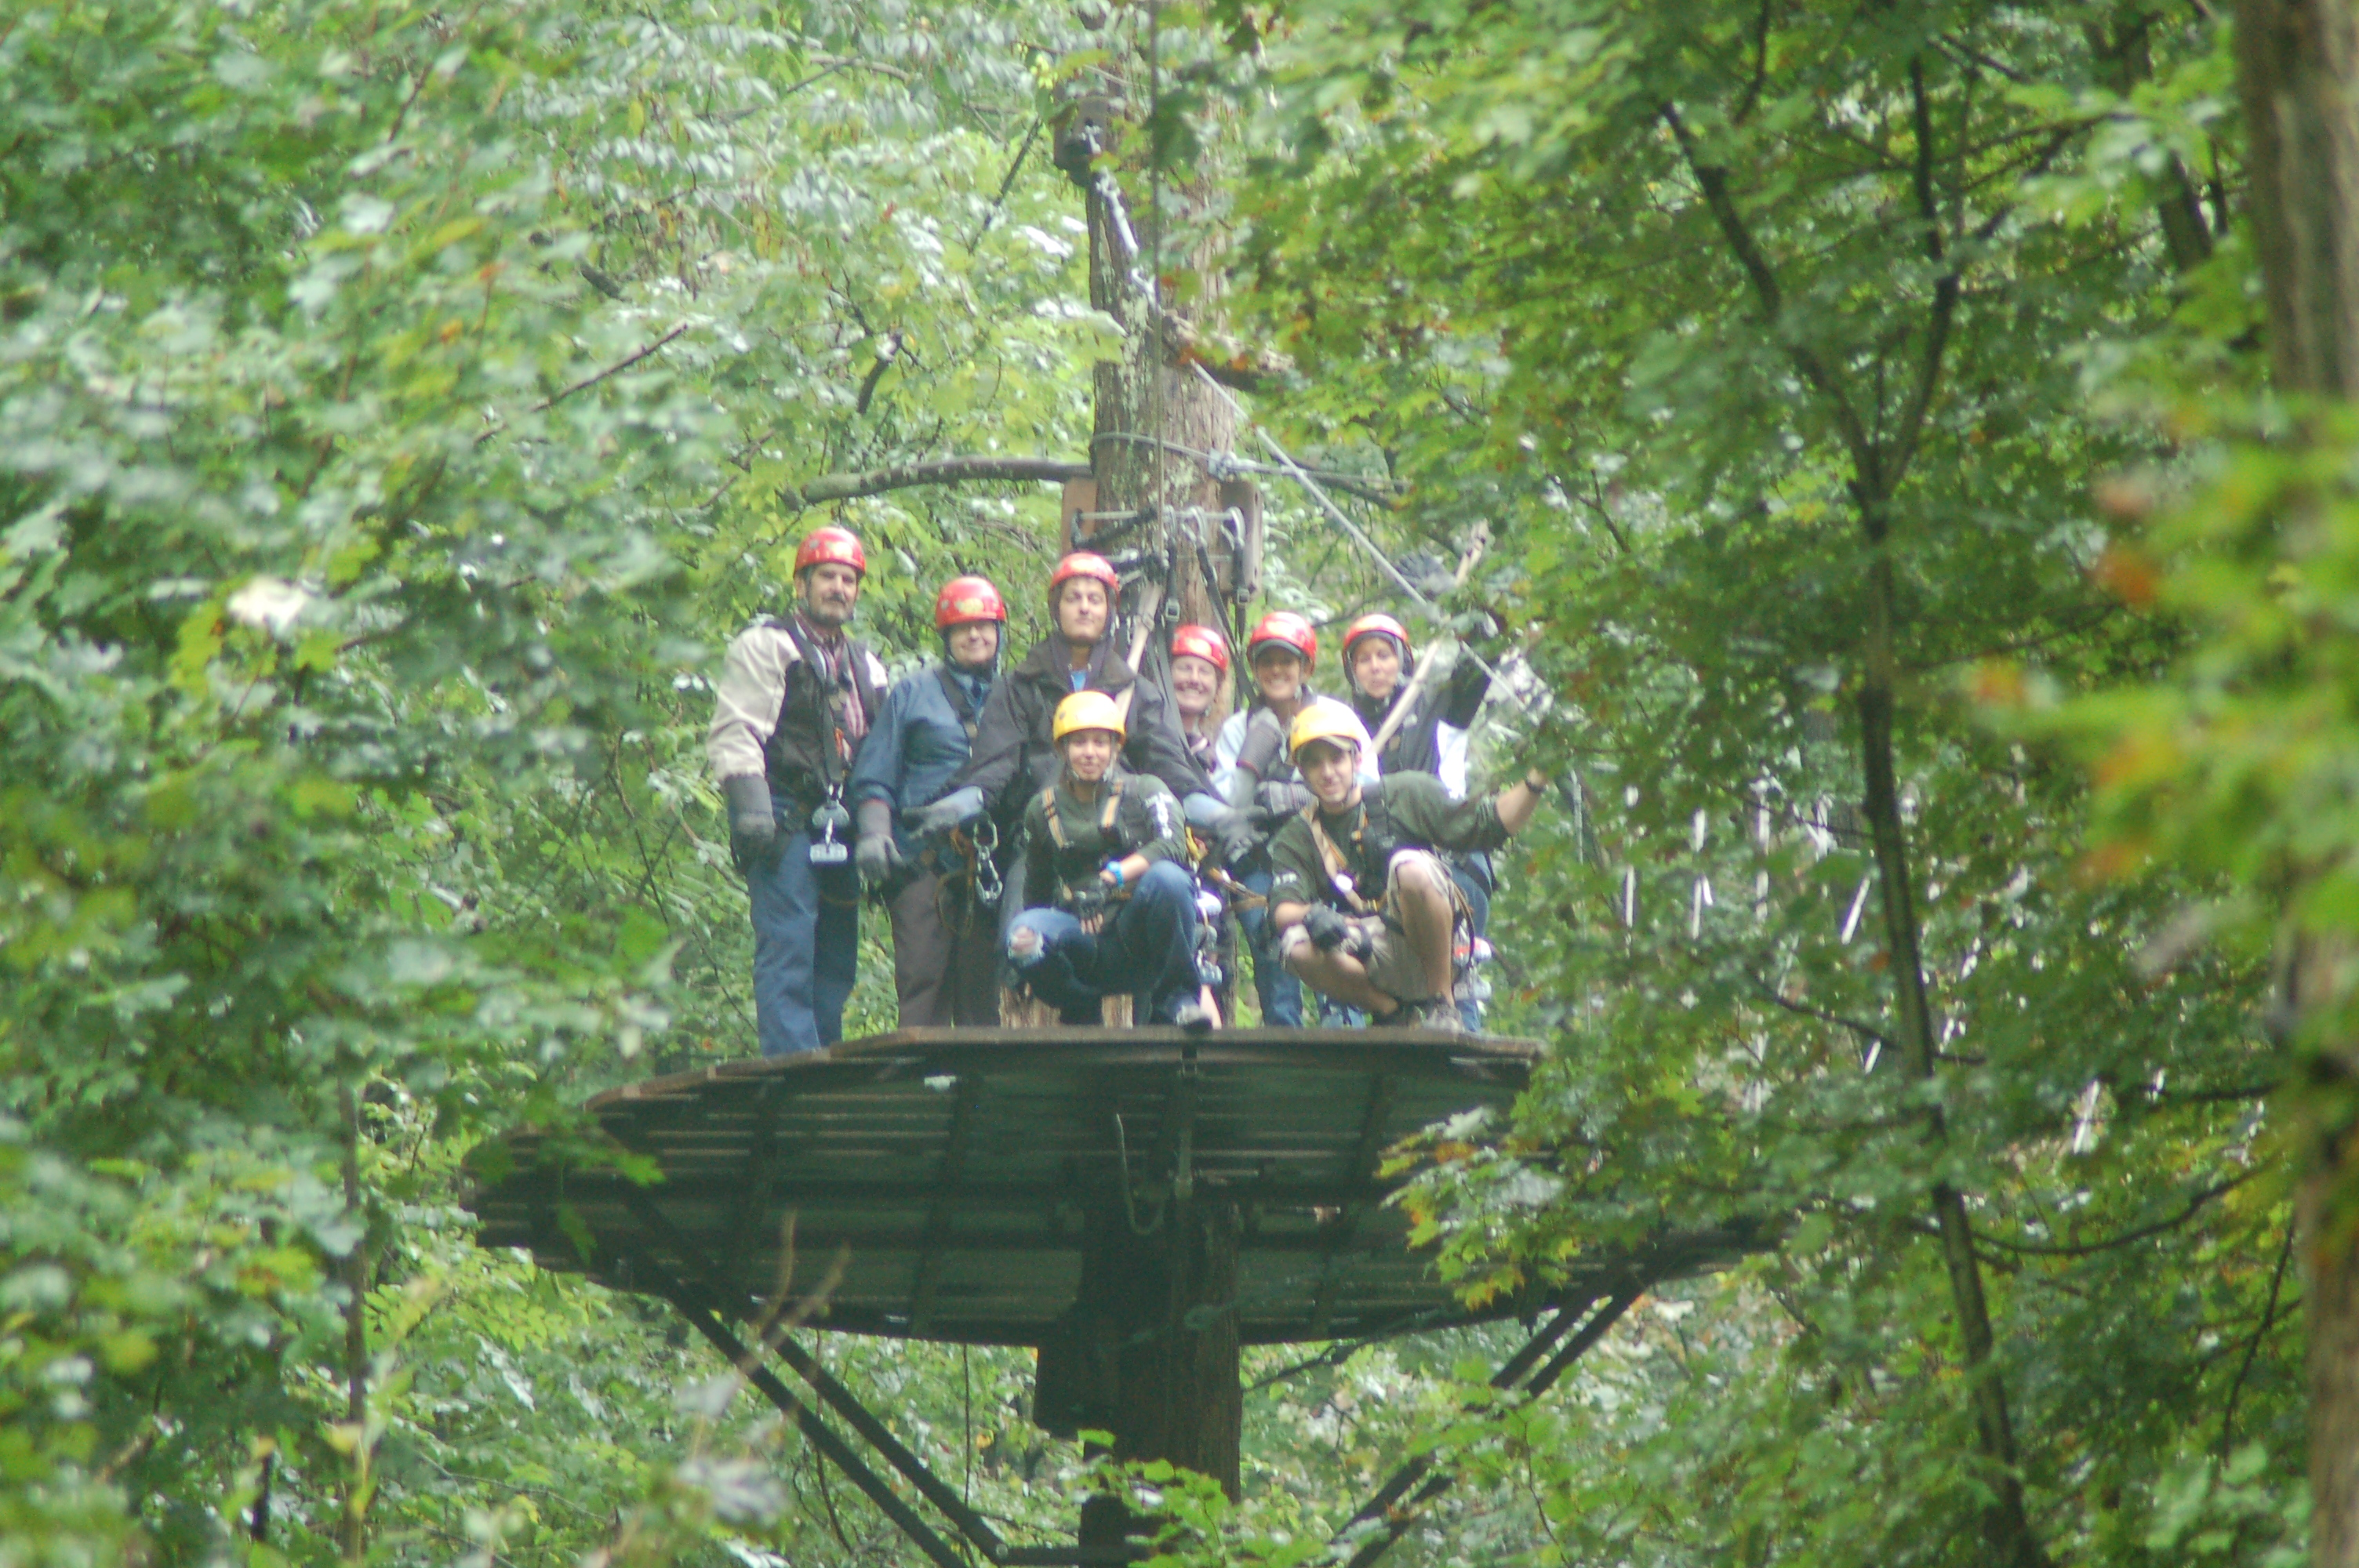 Tree Frog Canopy Tours - Glenmont, Ohio - WebReserv.com - your